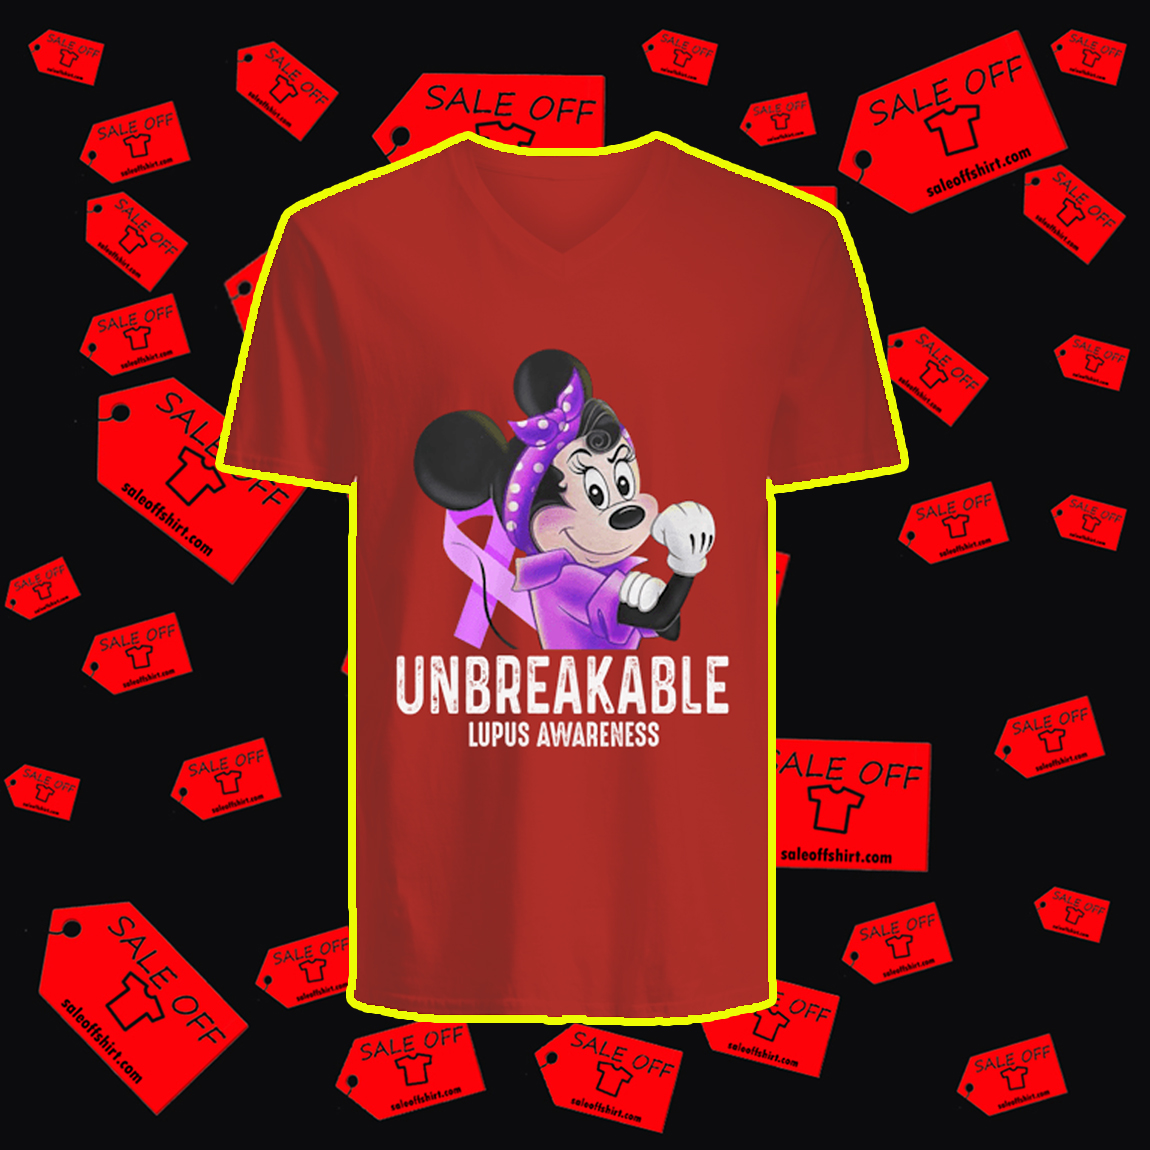 Disney Minnie Unbreakable Lupus Awareness v-neck